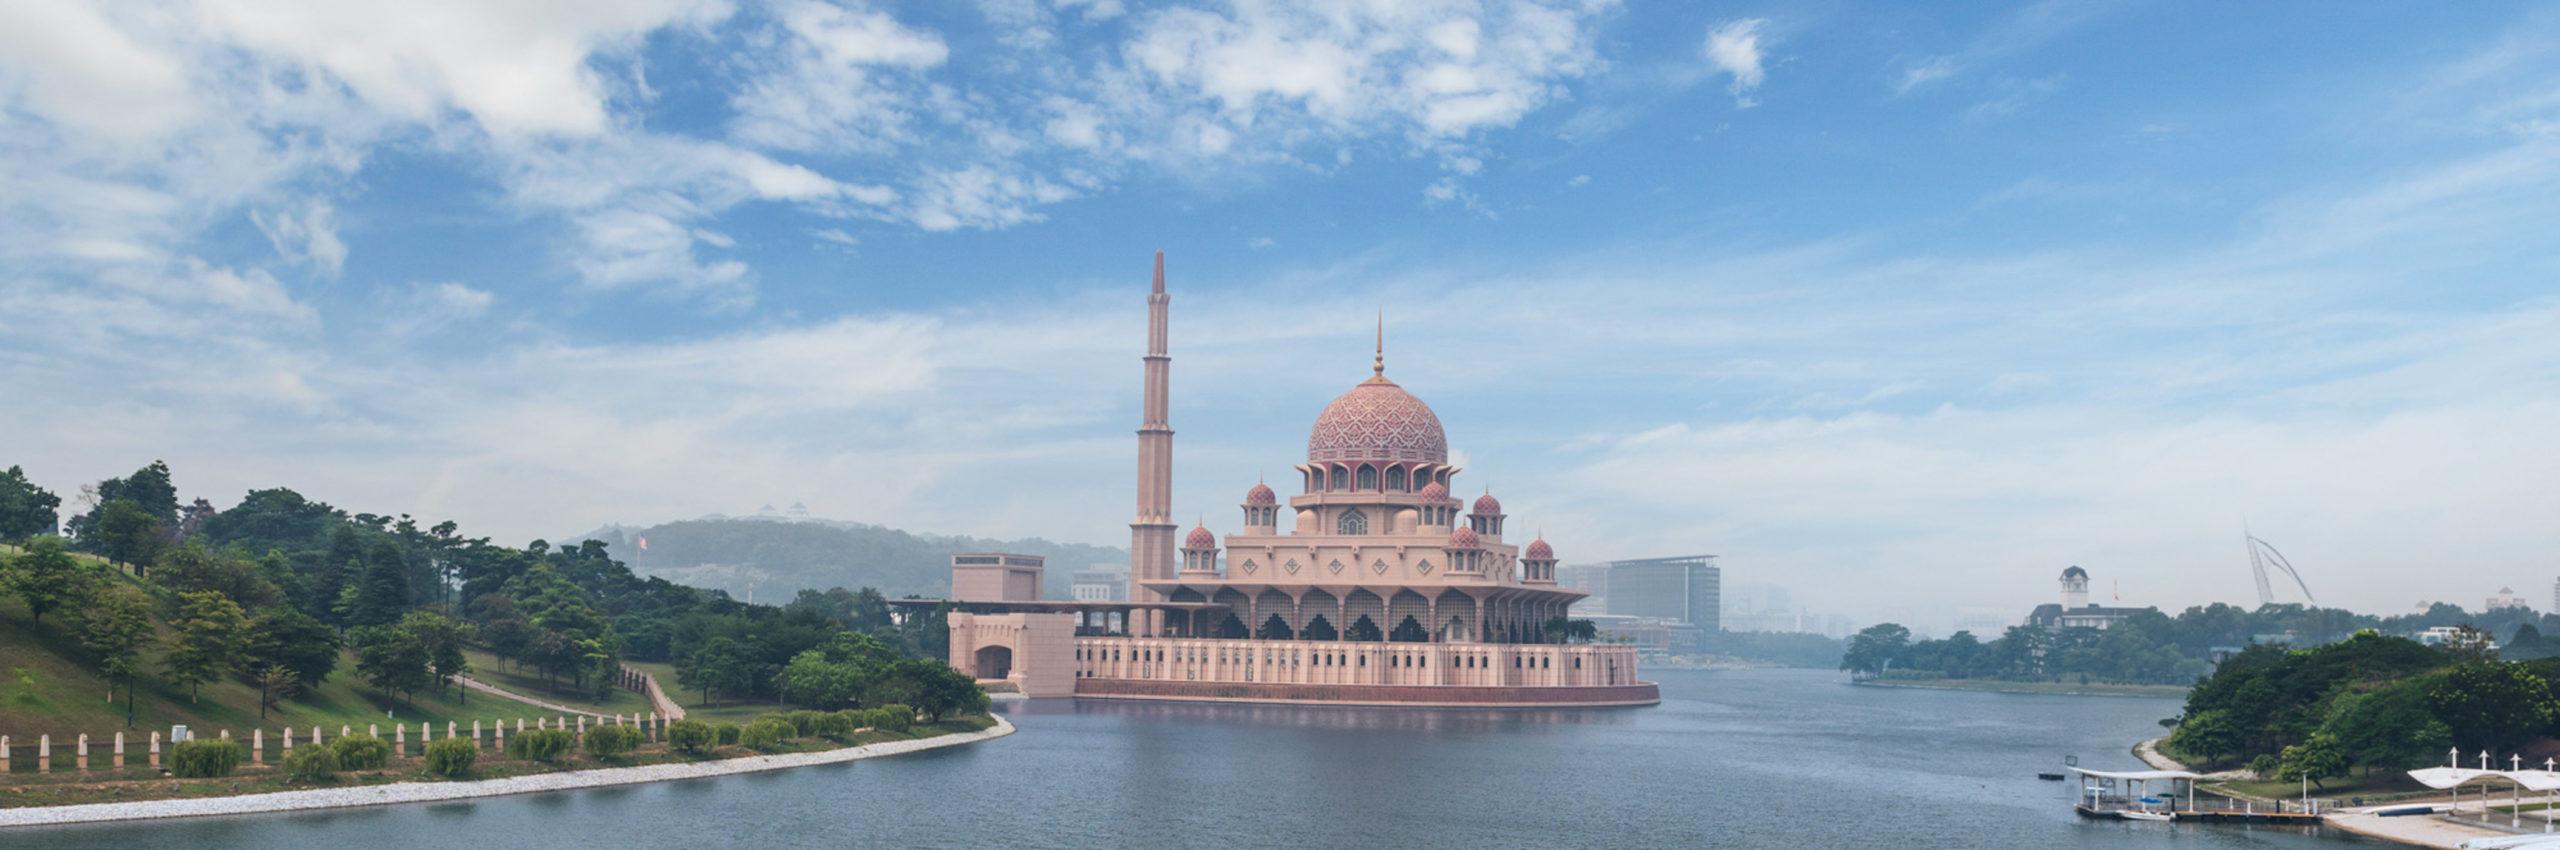 Destination-LM-Putrajaya05